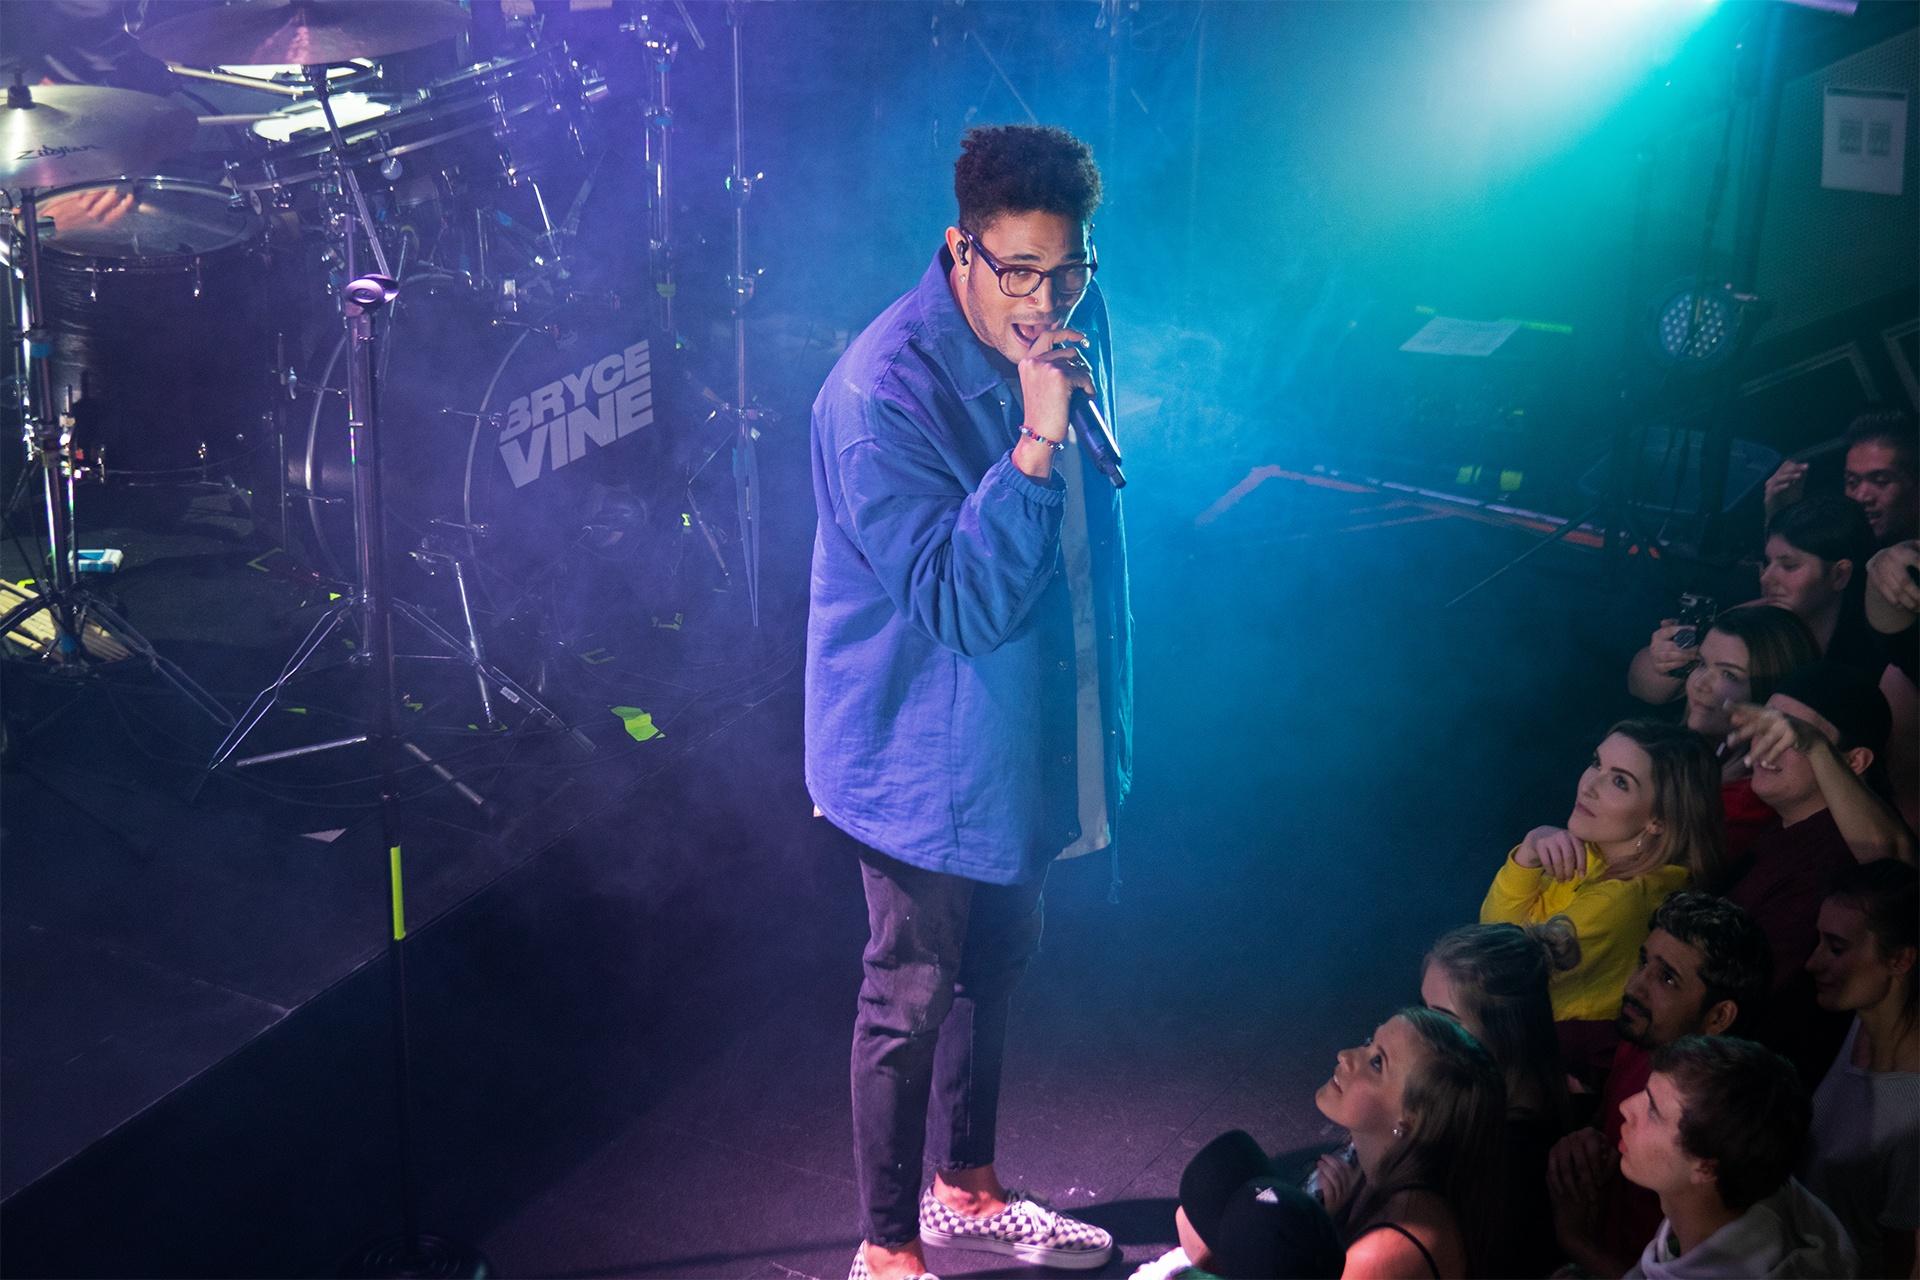 Bryce Vine shows Vancouver why he's LA's next hip-pop superstar (PHOTOS)